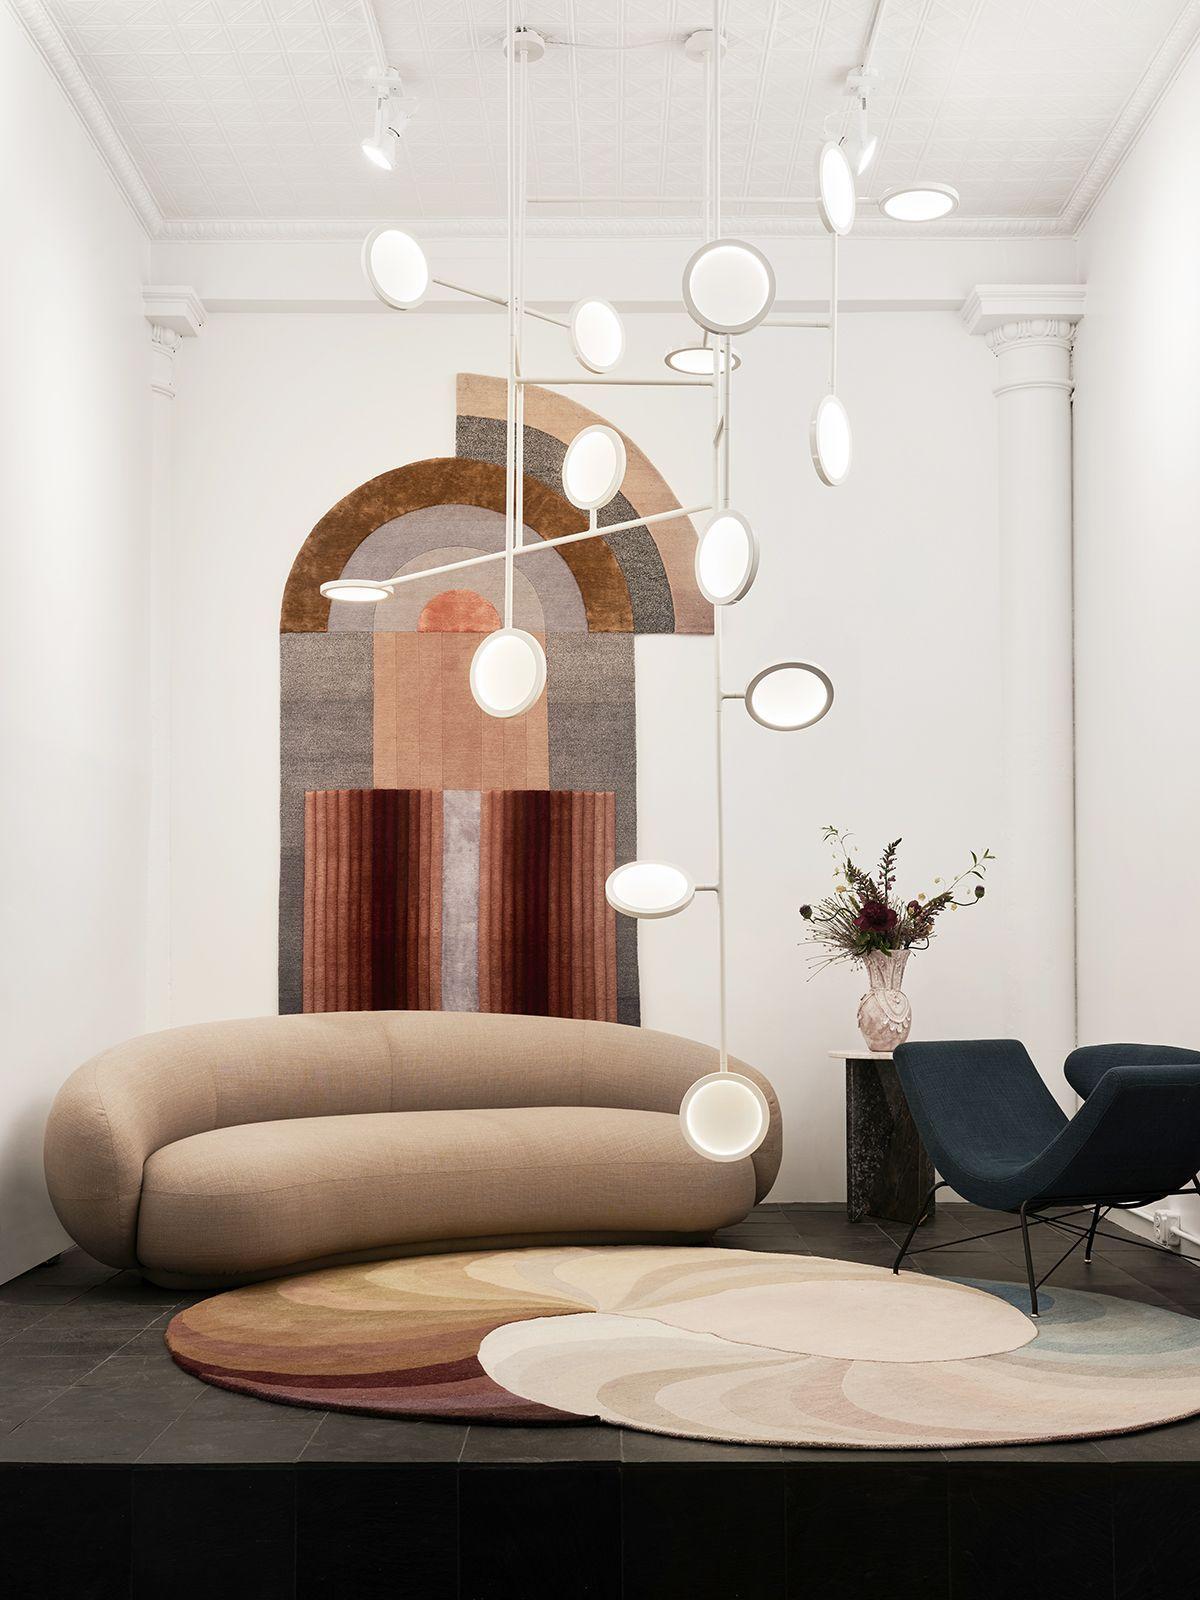 Pin By Dasya Kawabata On Furniture In 2020 Interior Interior Design Design